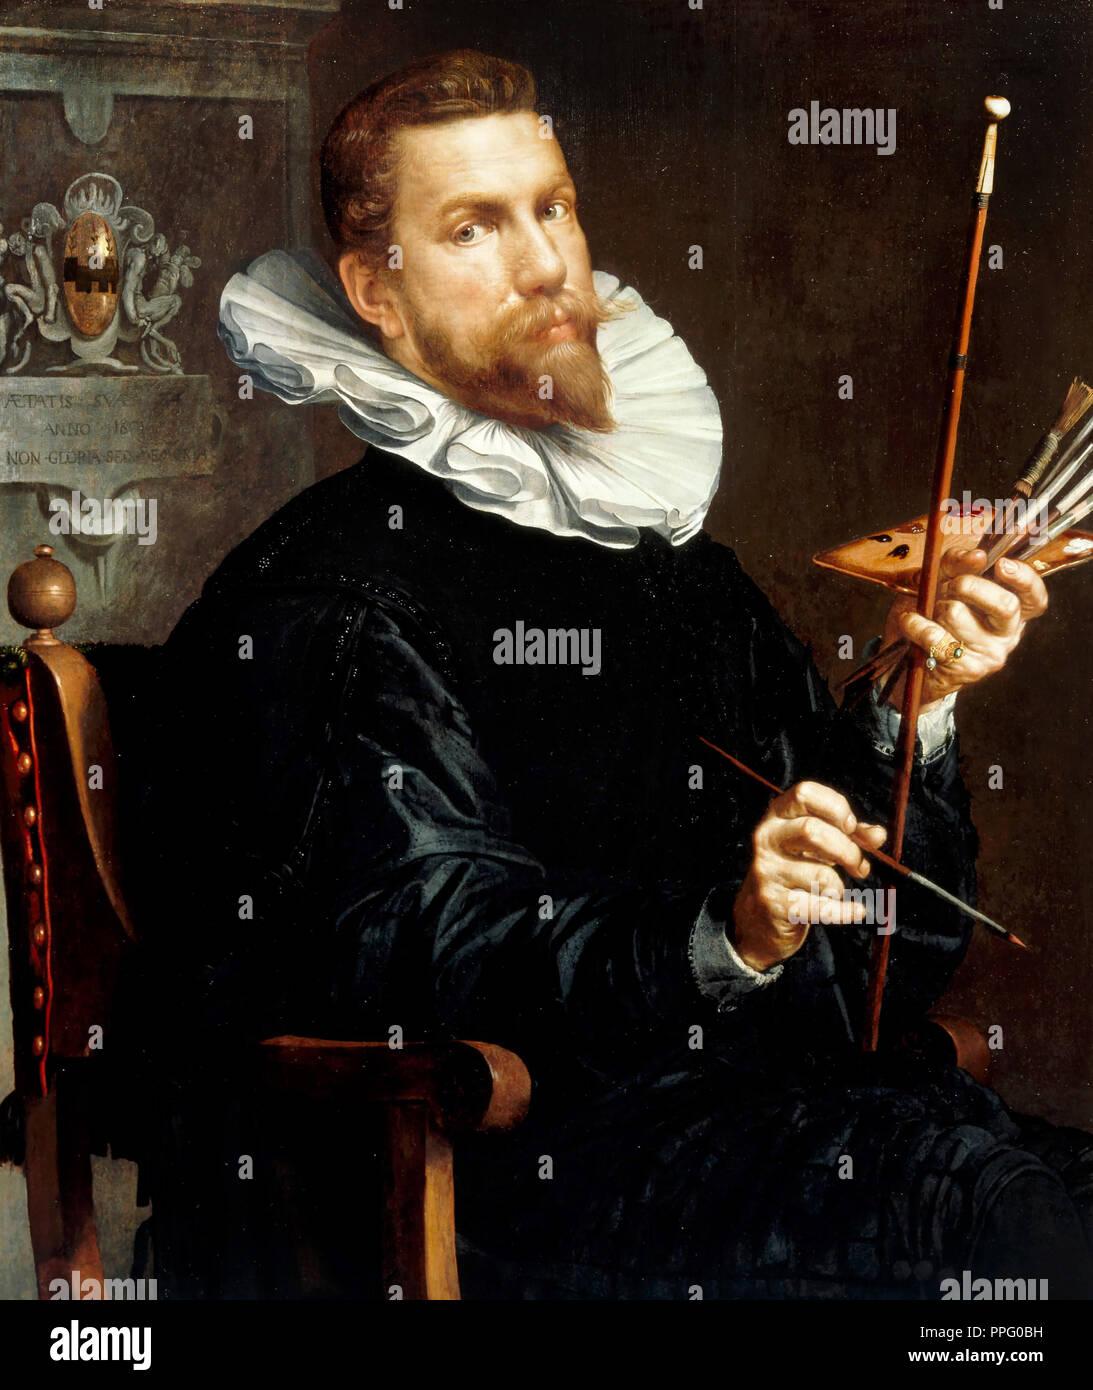 Joachim Wtewael, Self-Portrait 1601 Oil on canvas. Centraal Museum in Utrecht, Netherlands. - Stock Image